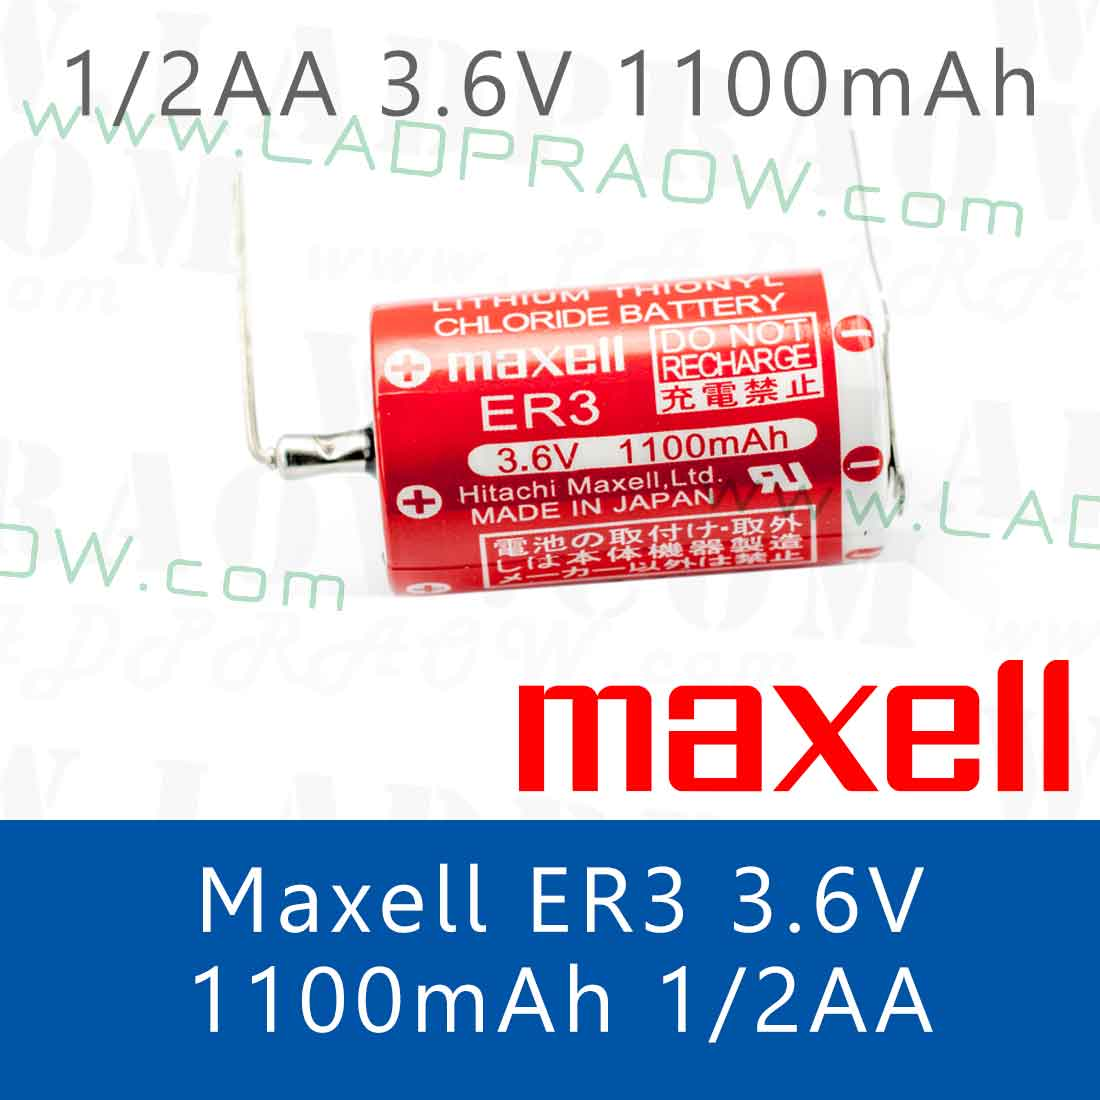 Maxell Lithium Battery ER3 แบตเตอรี่ลิเธียม 3.6V 1/2AA